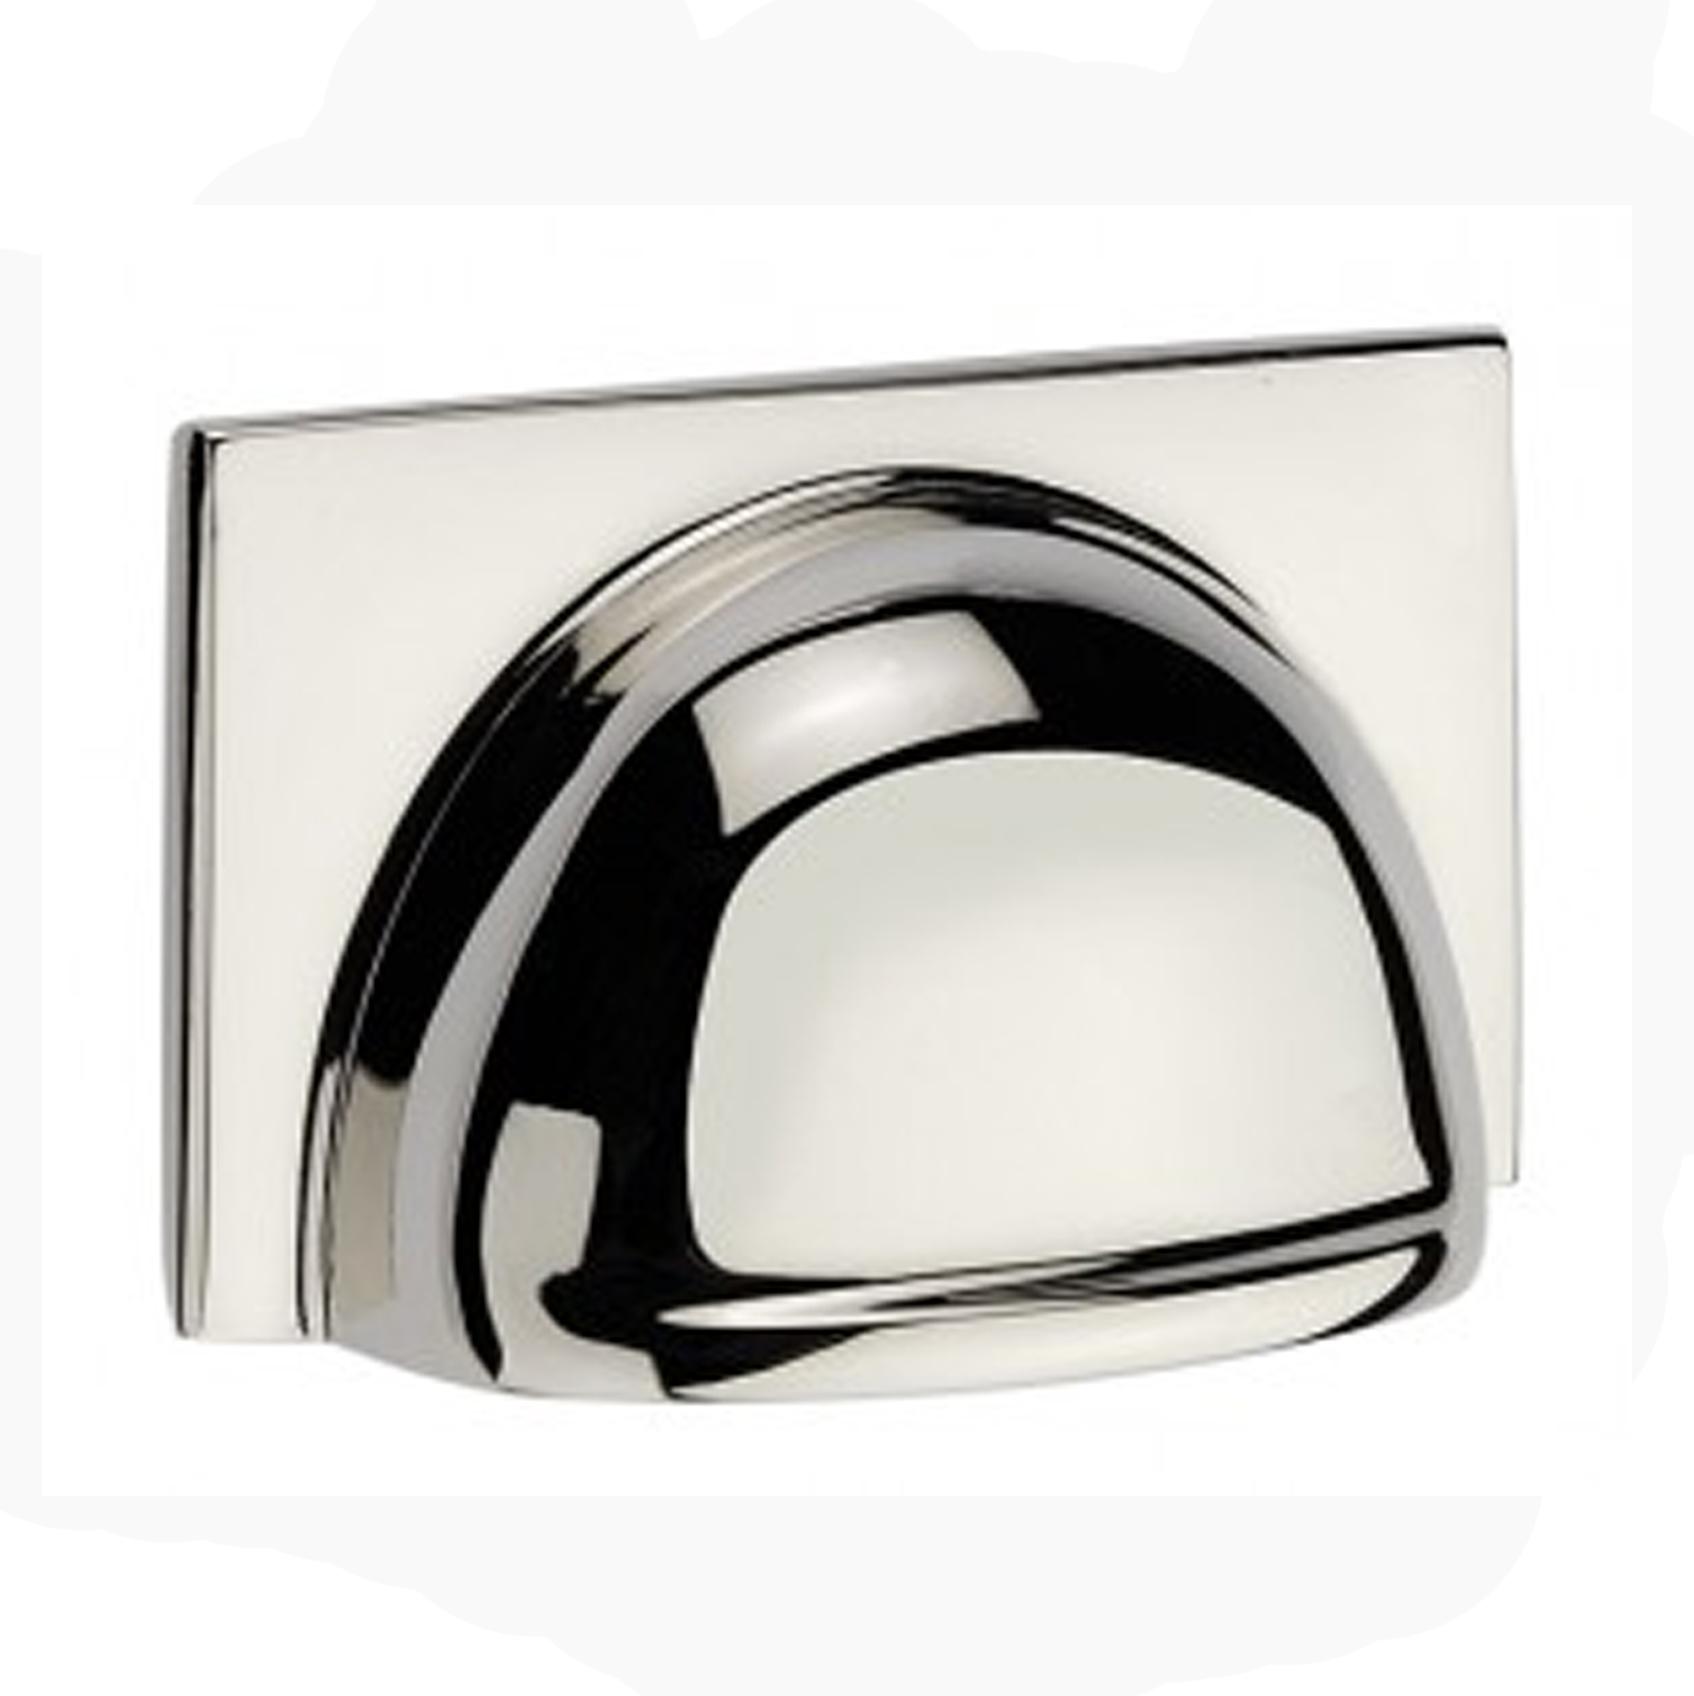 Gosforth Nickel – Chrome Pull-Small